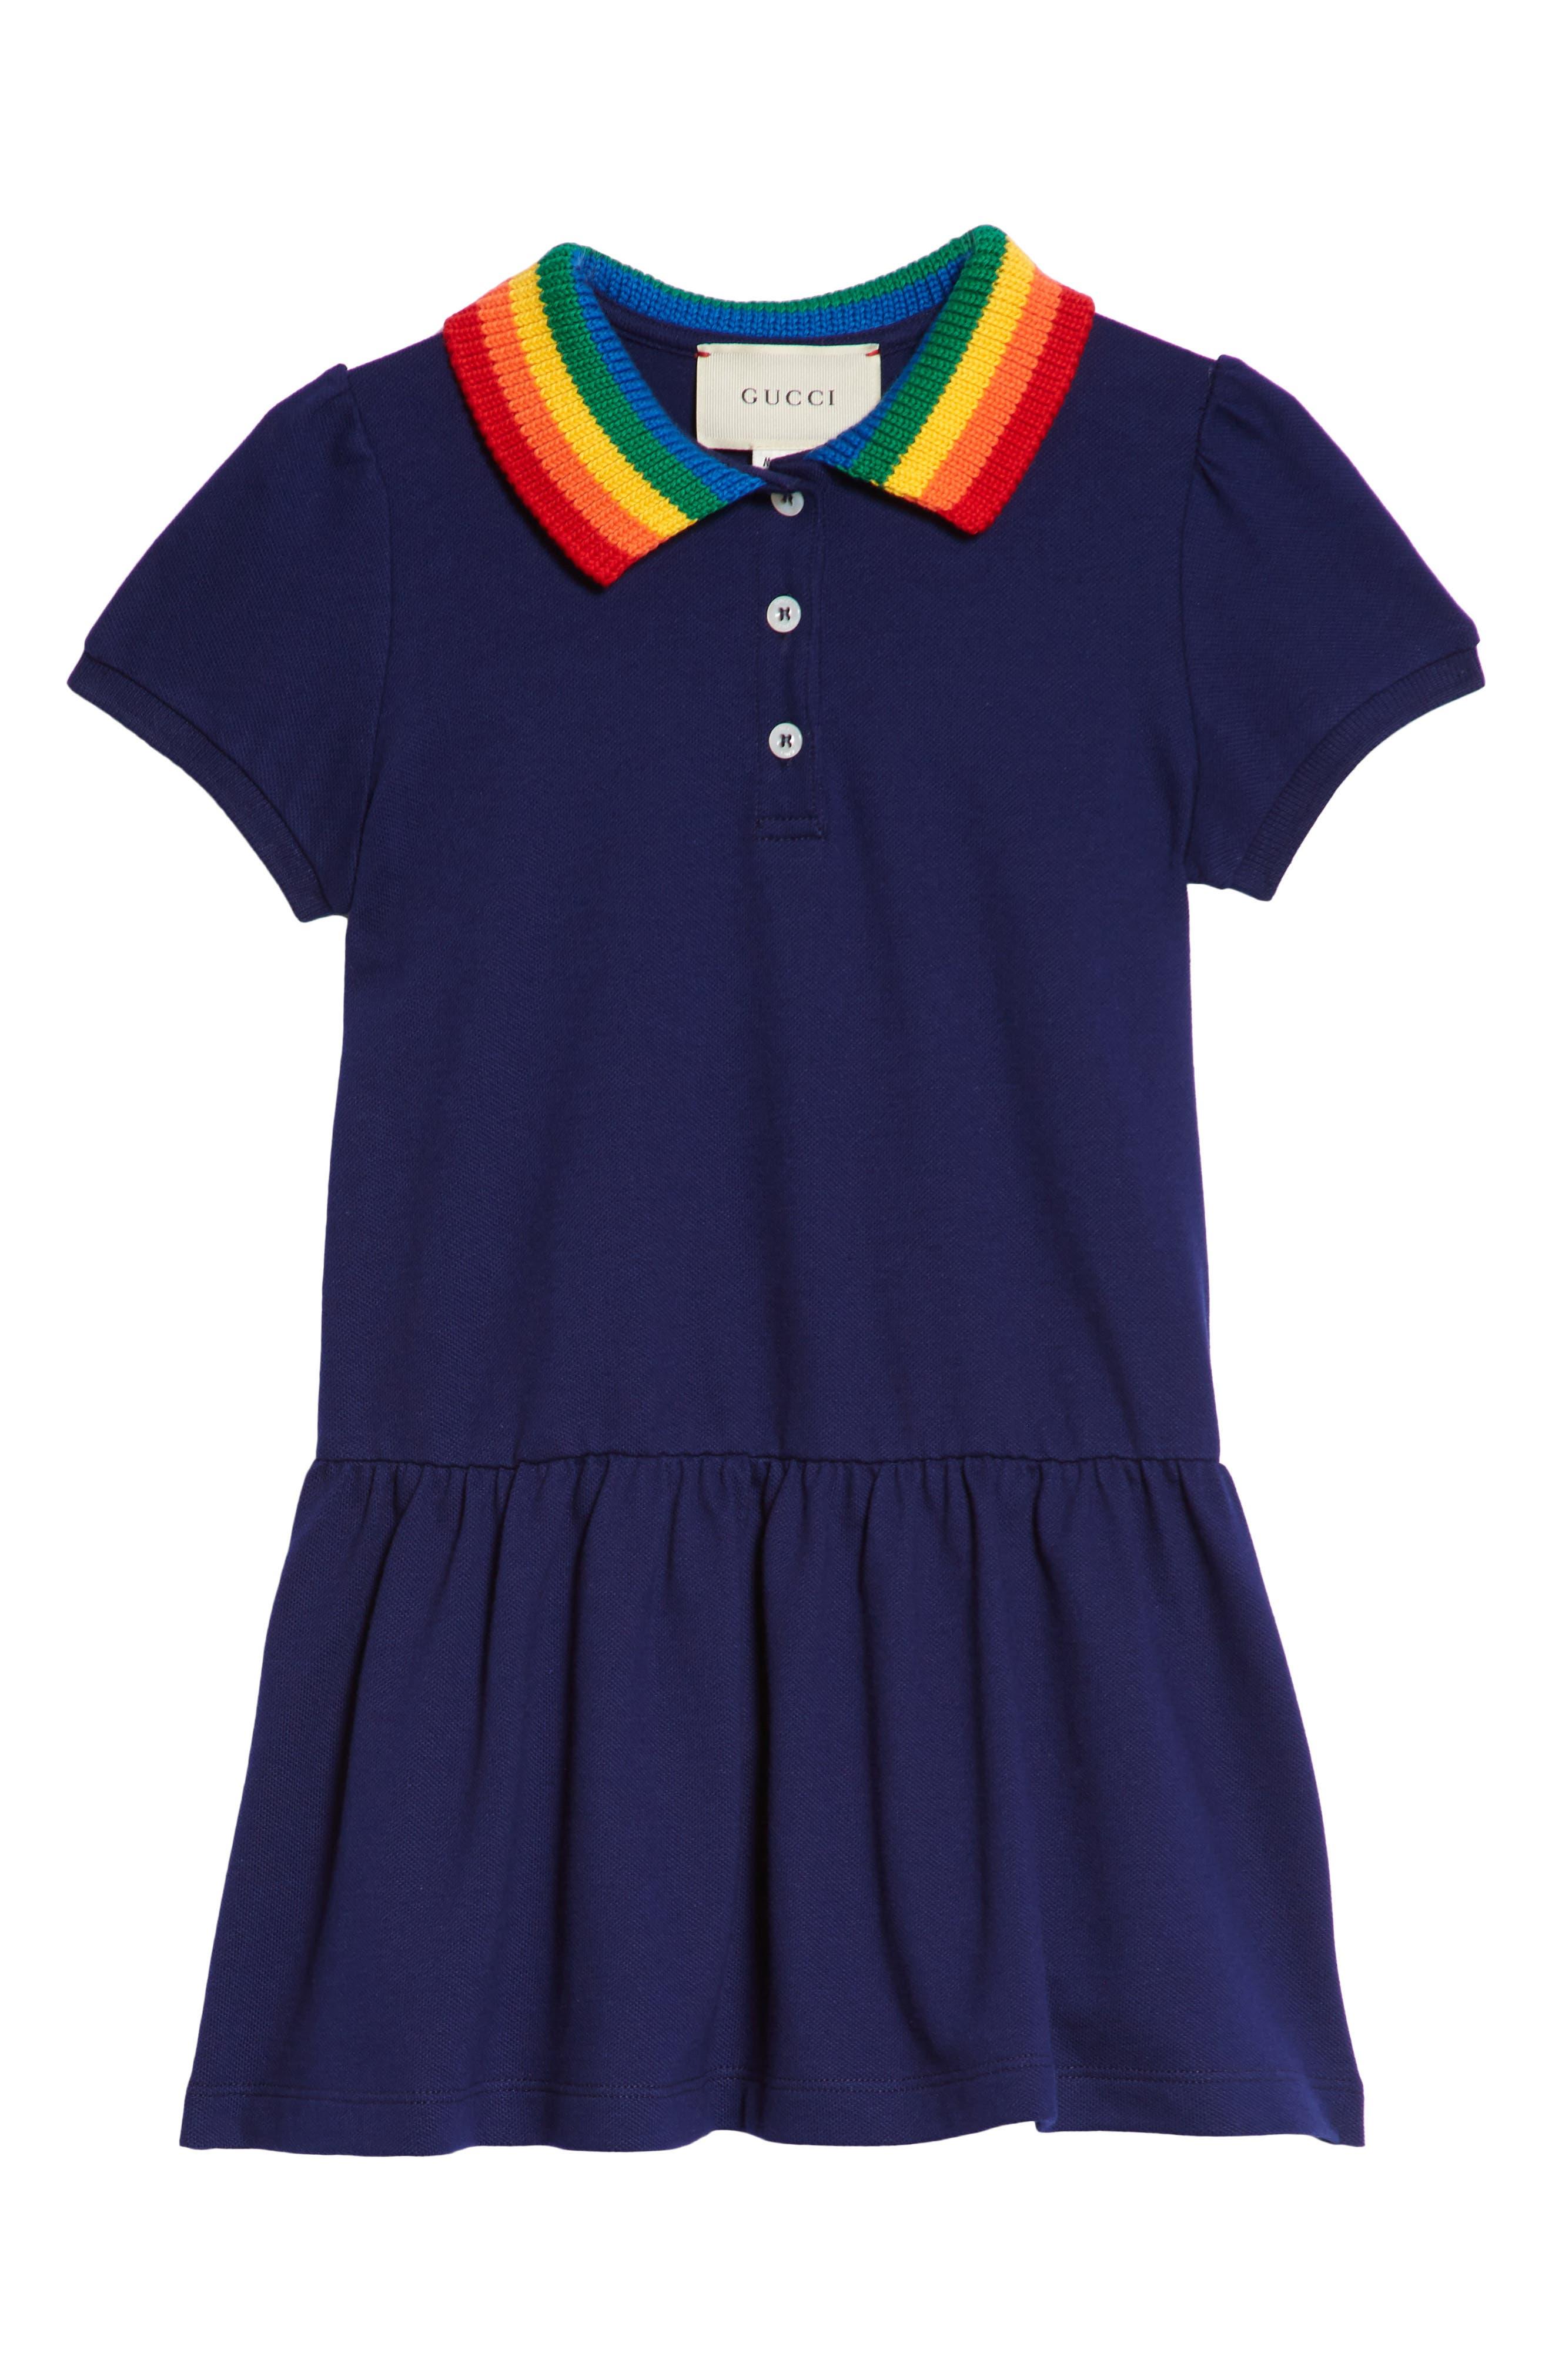 Polo Dress,                             Main thumbnail 1, color,                             BLUE MULTI